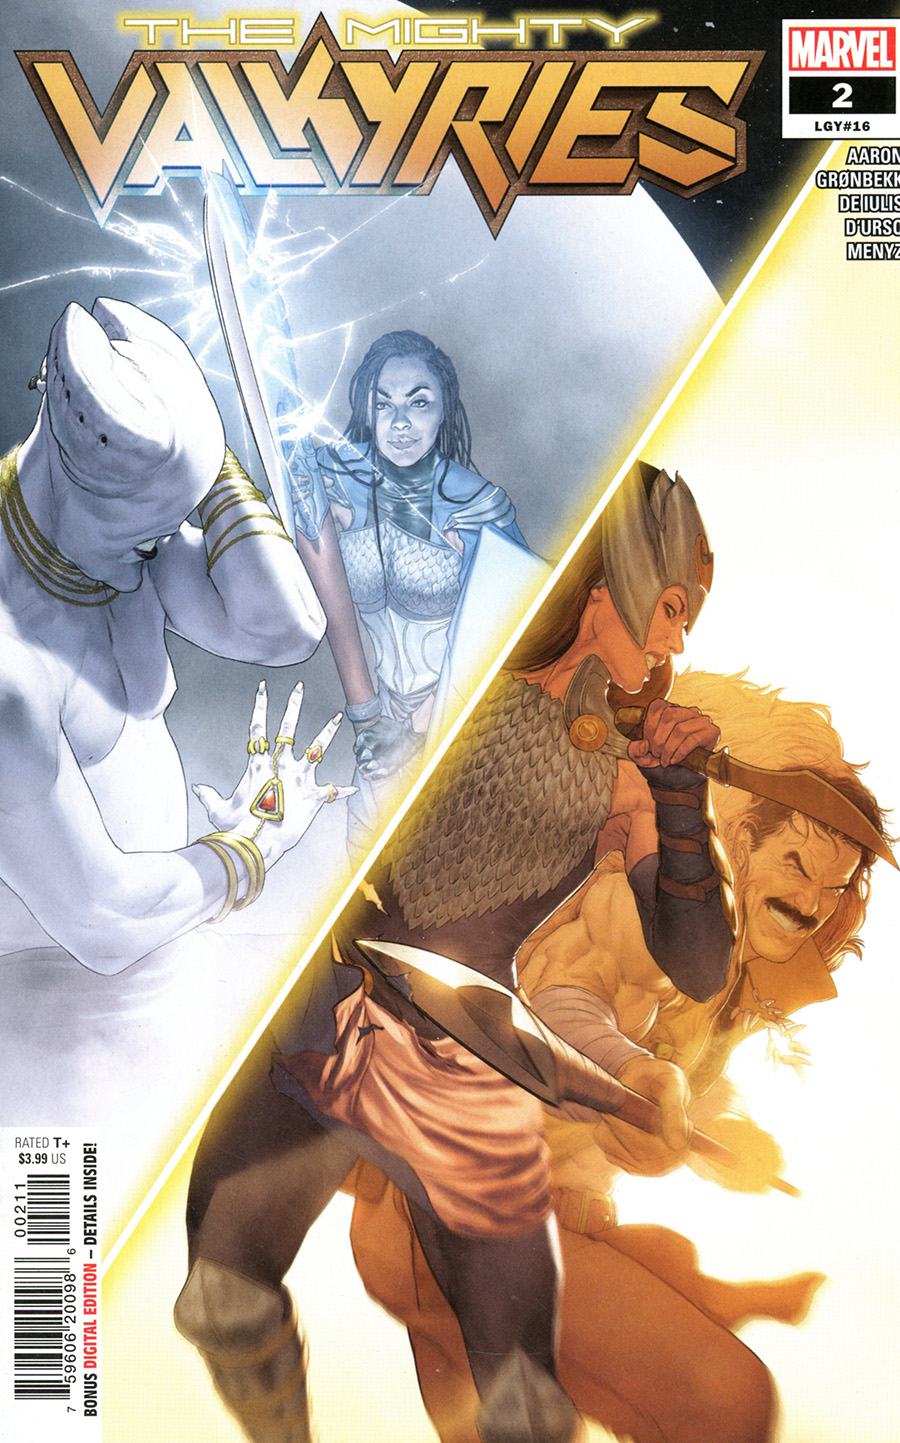 Mighty Valkyries #2 Cover A Regular Mattia De Iulis Cover